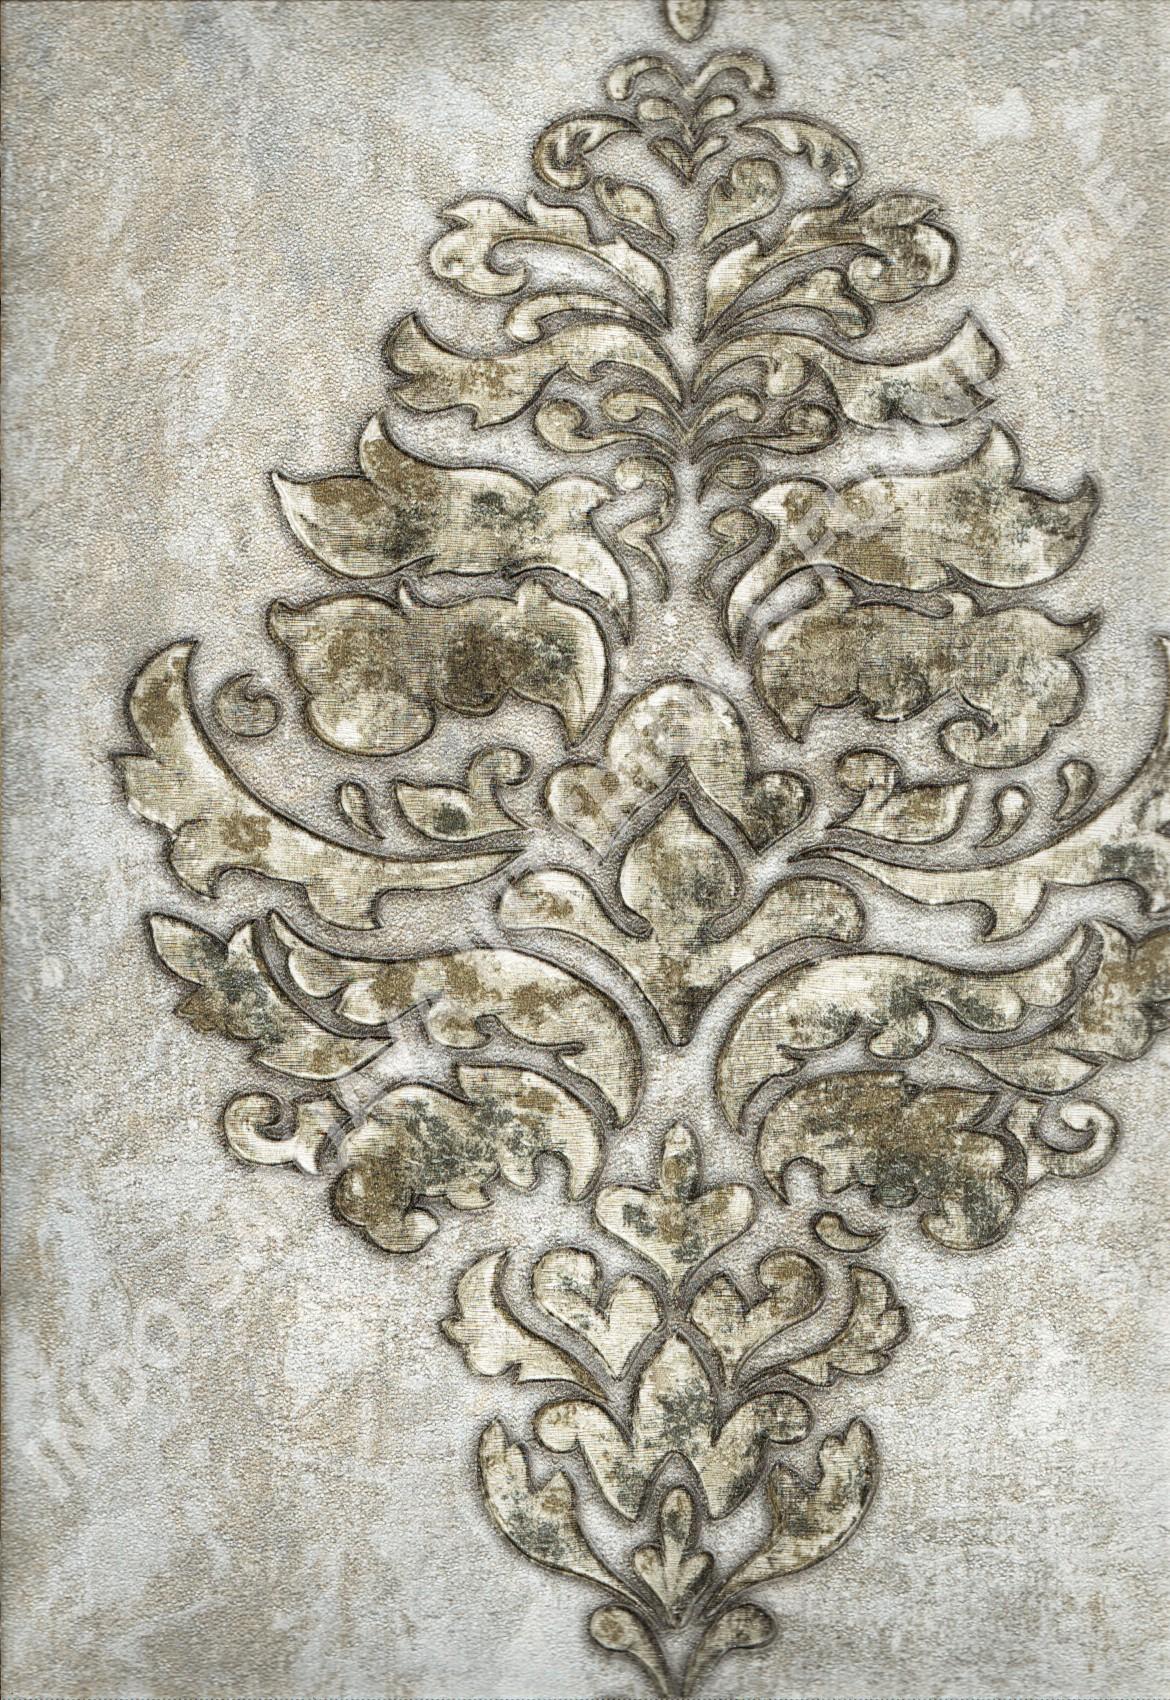 wallpaper   Wallpaper Klasik Batik (Damask) DL11304:DL11304 corak  warna